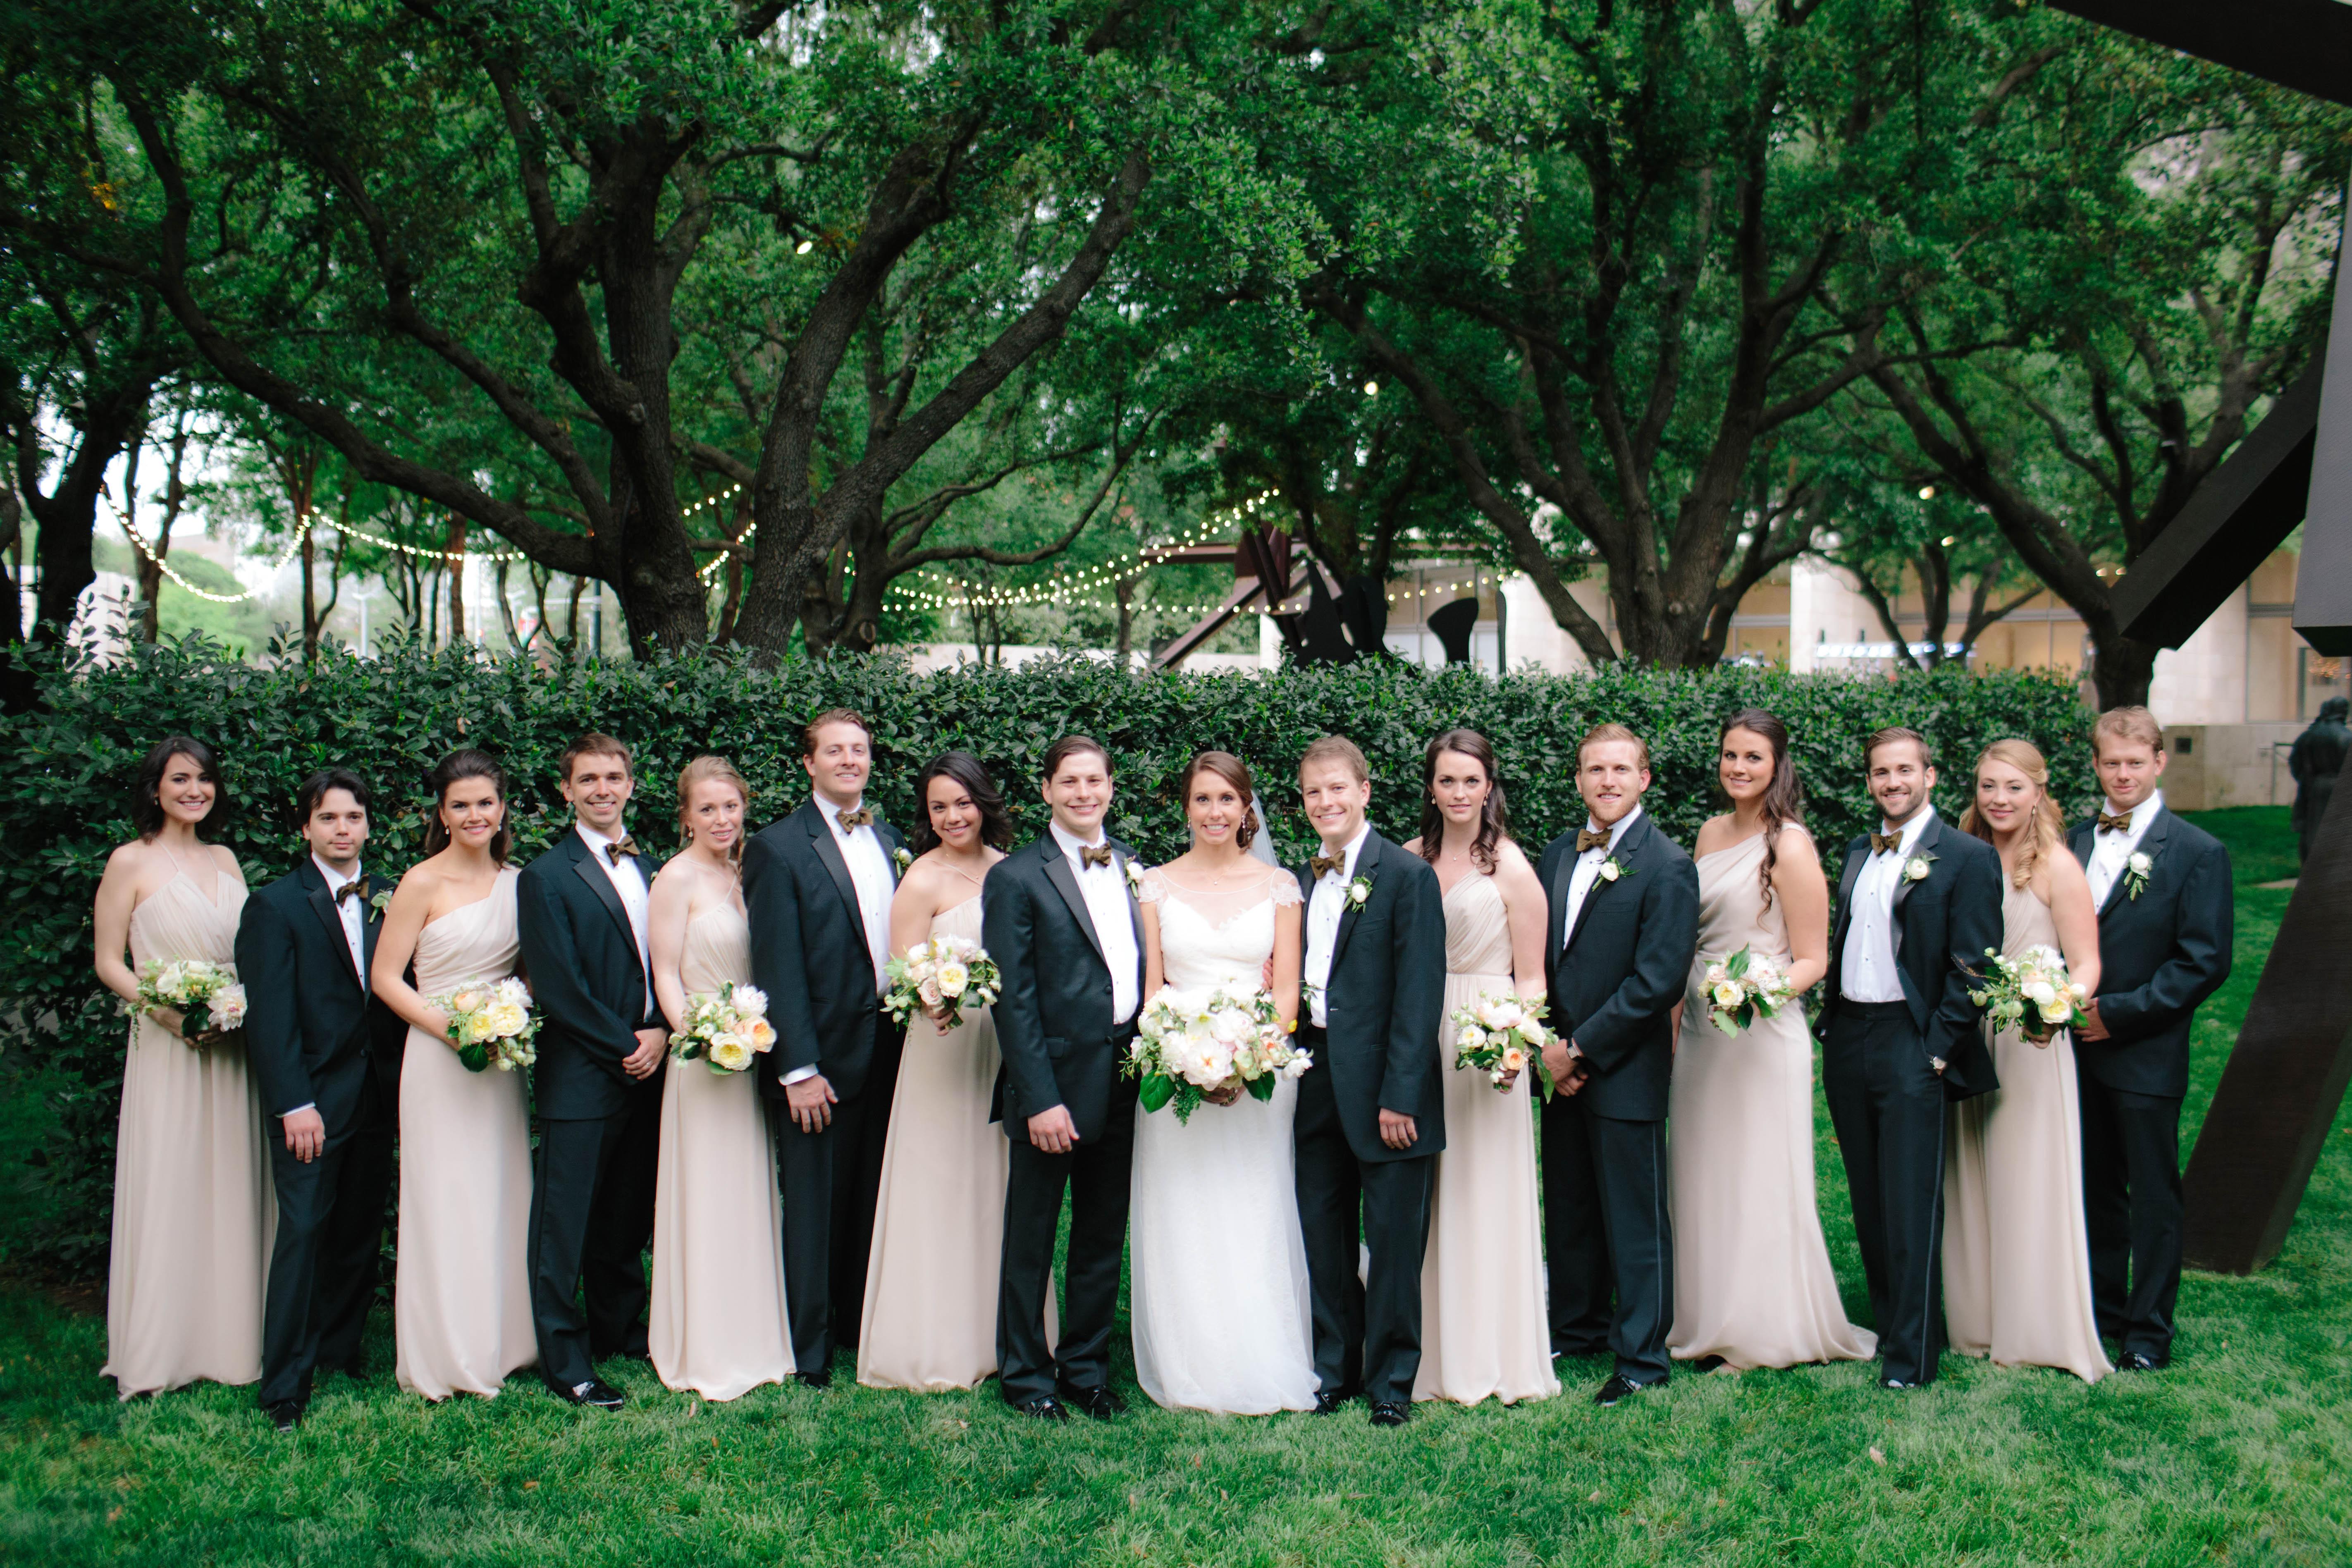 Ivory and Black Wedding Party - Elizabeth Anne Designs: The Wedding Blog